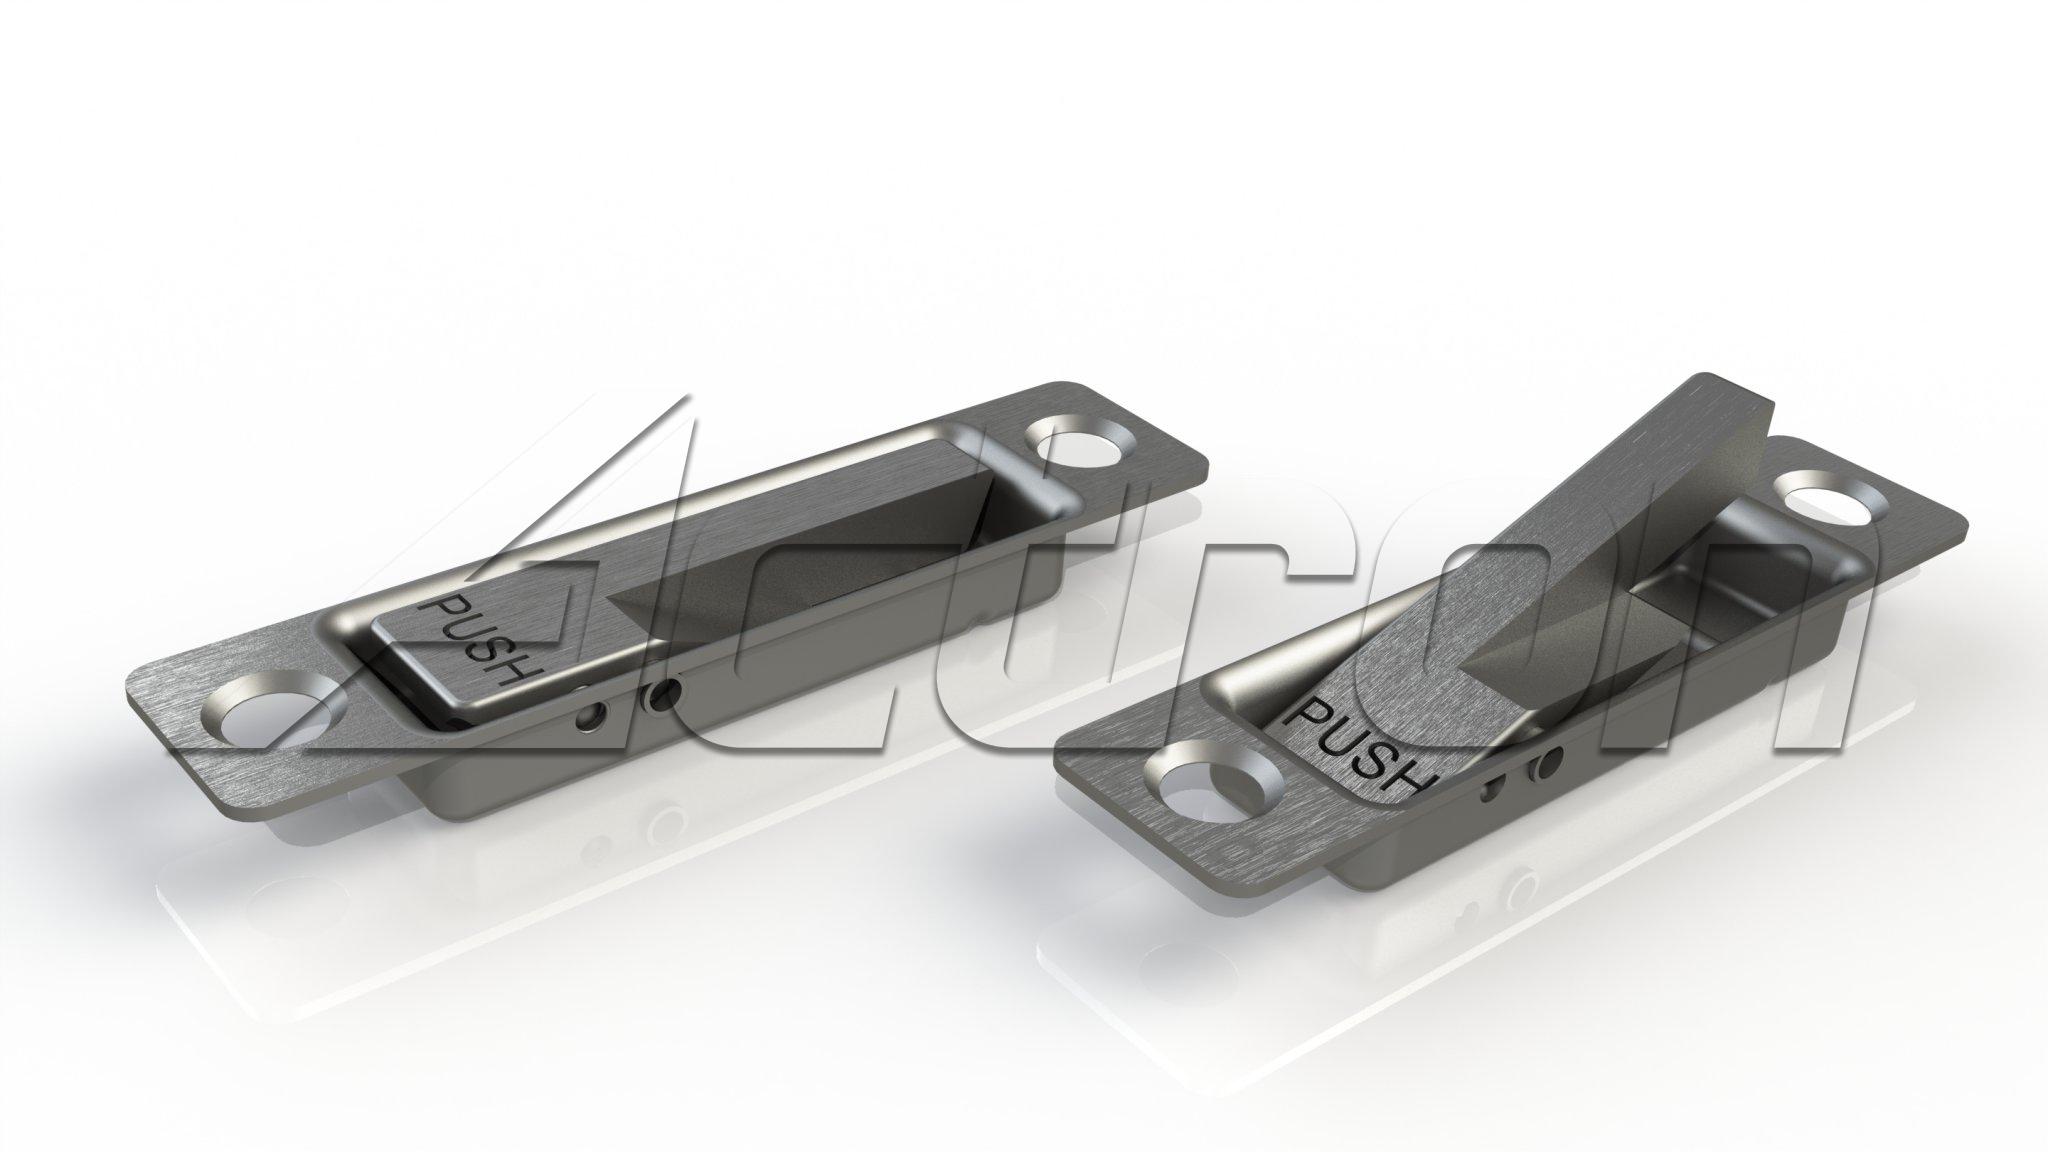 latch-assy-8211-retainer-5319-a35020.jpg